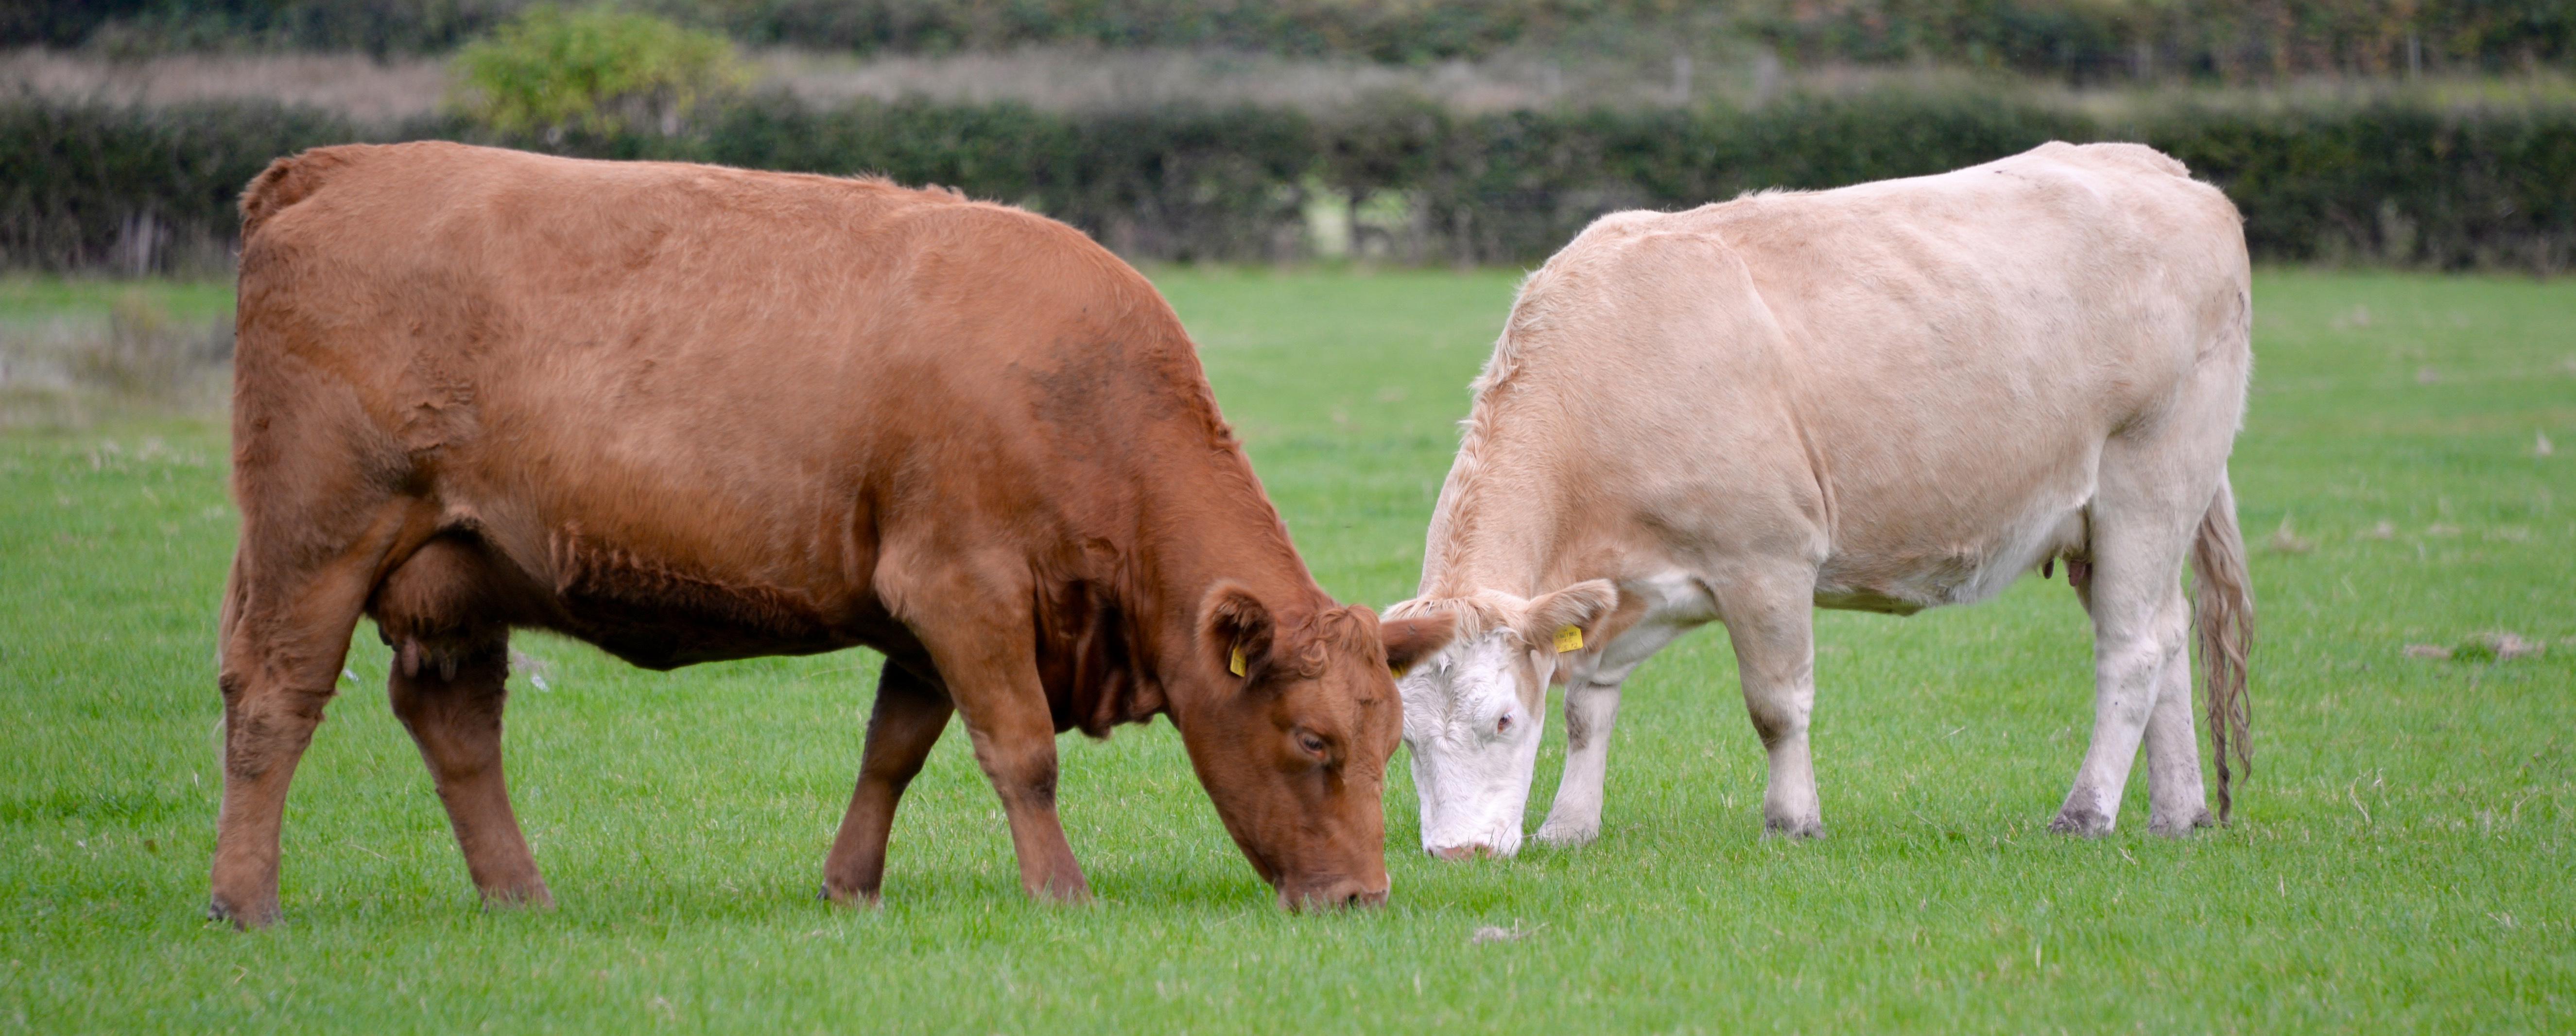 2-cows-nick-s